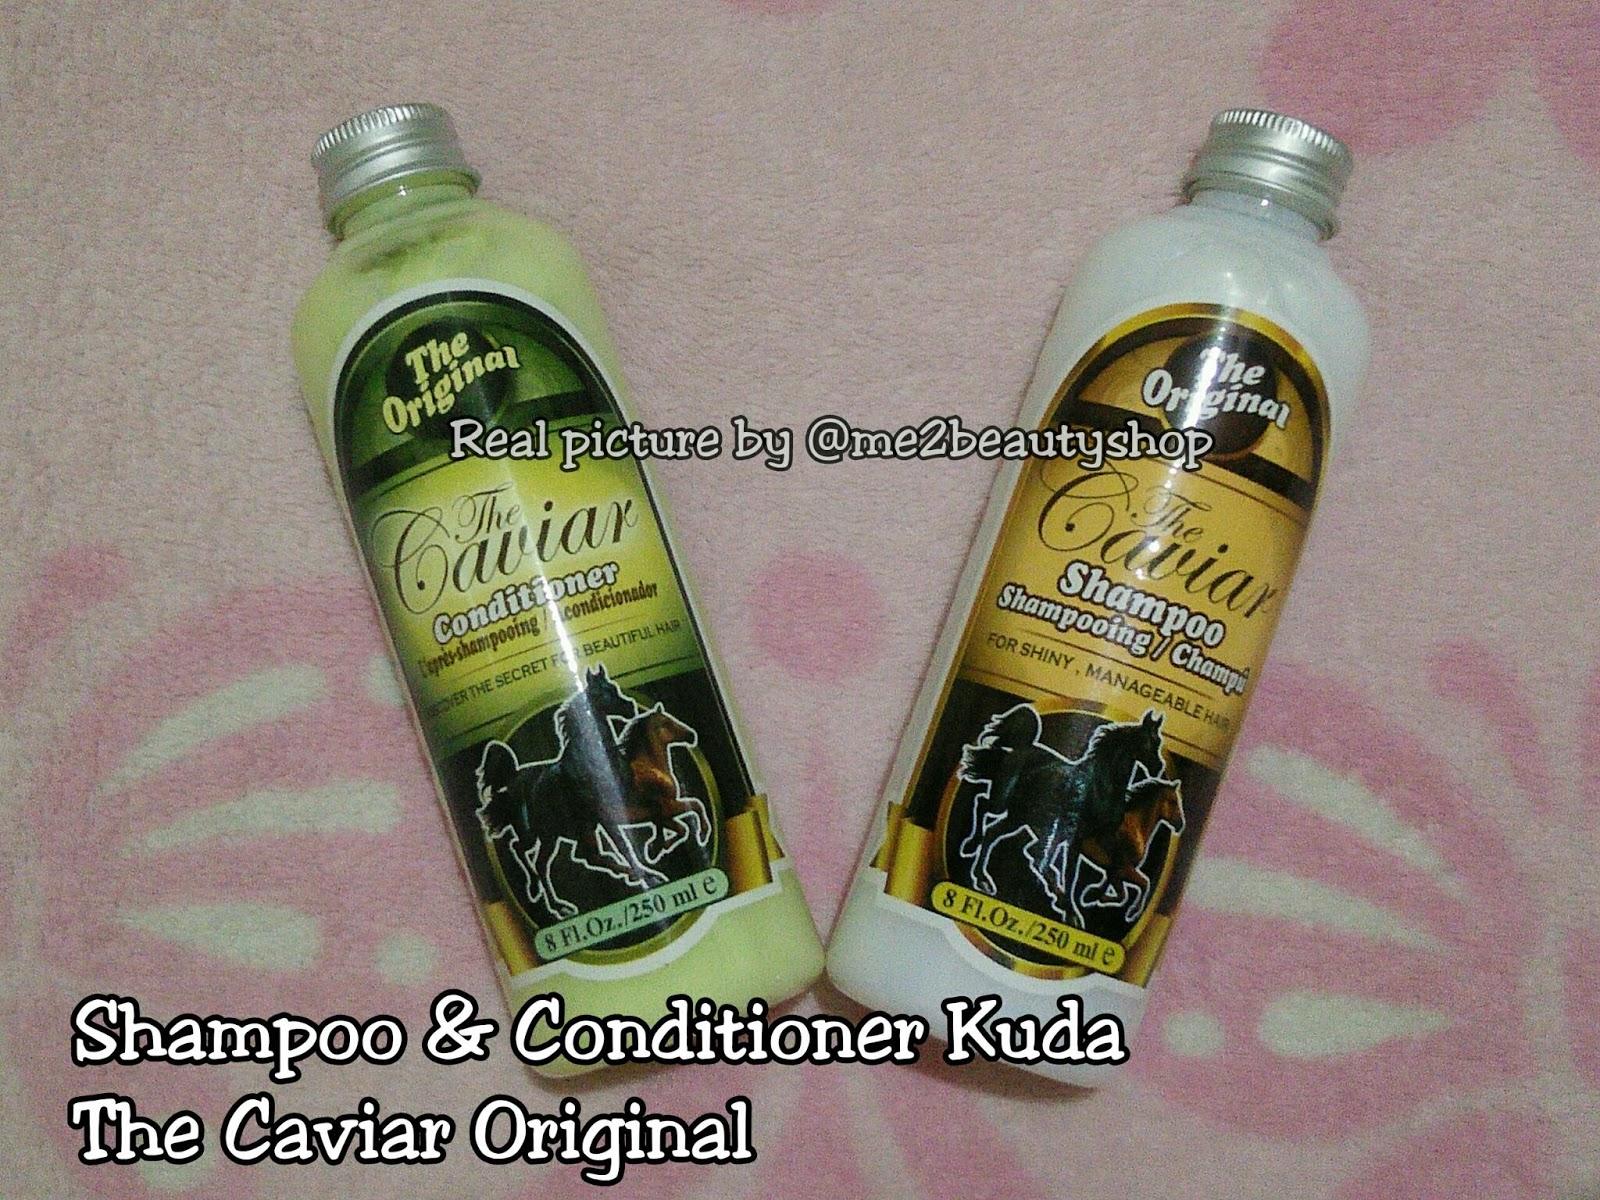 Meme Beauty Shop Banjarmasin Caviar Shampoo Bpom Info Order Line Xlf9128o